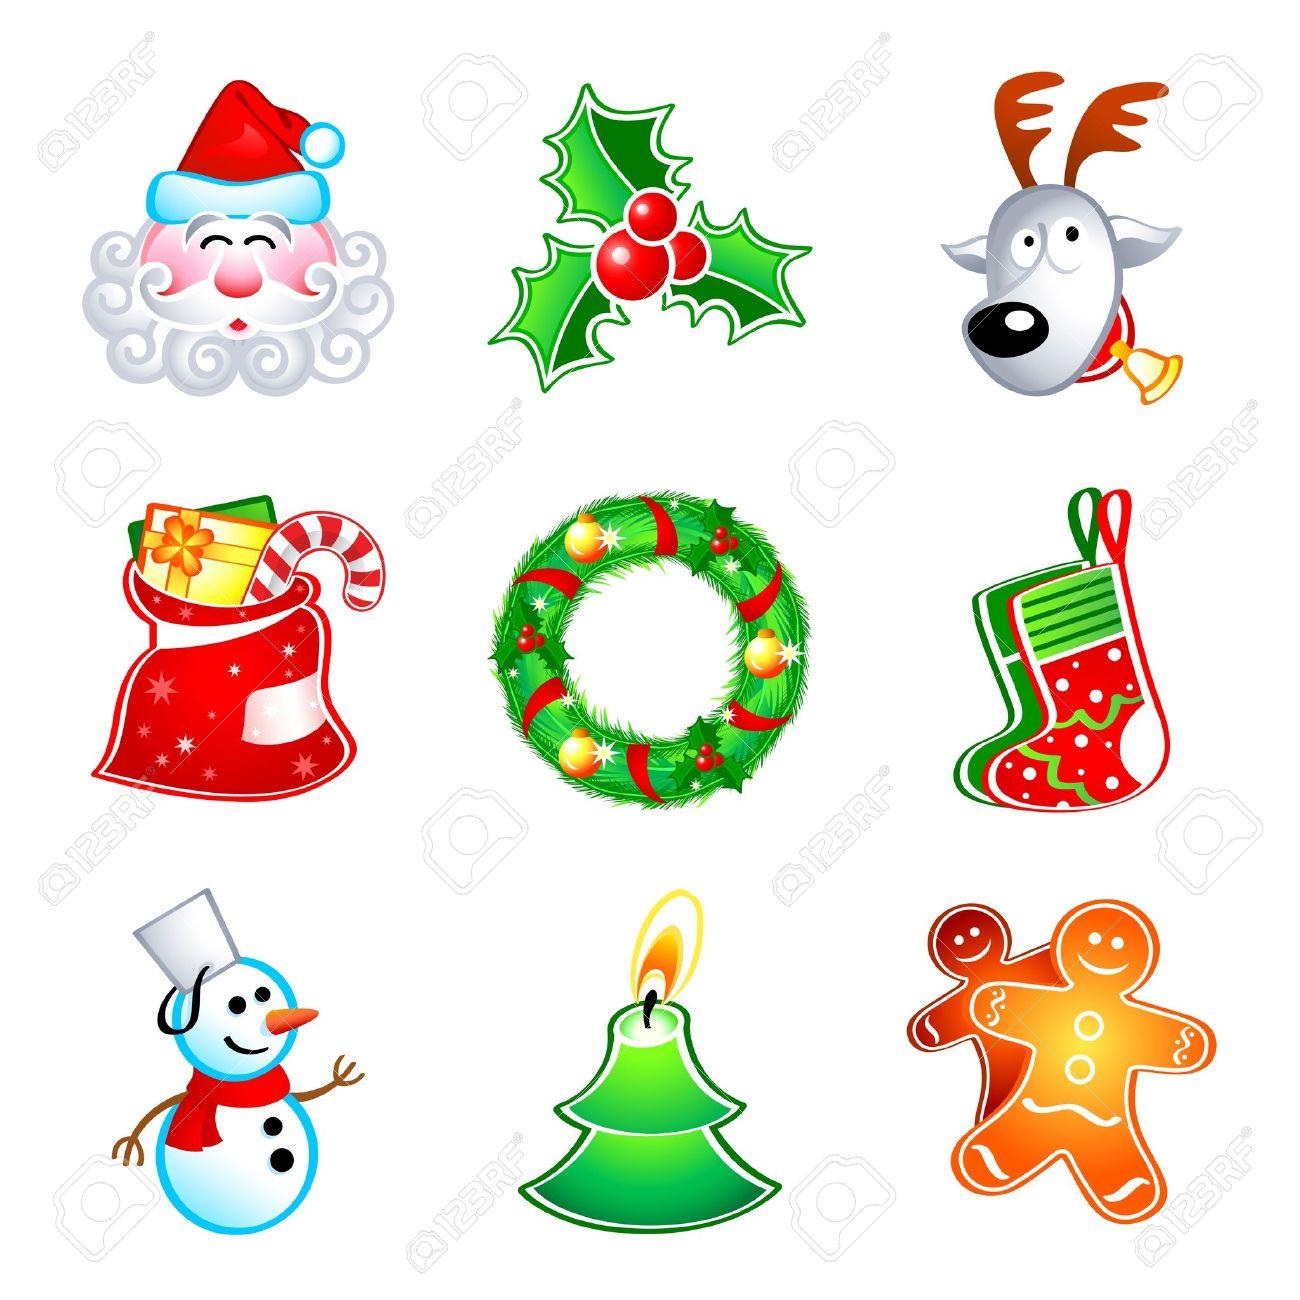 Symbols Of Christmas.Colorful Icons With Traditional Christmas Symbols